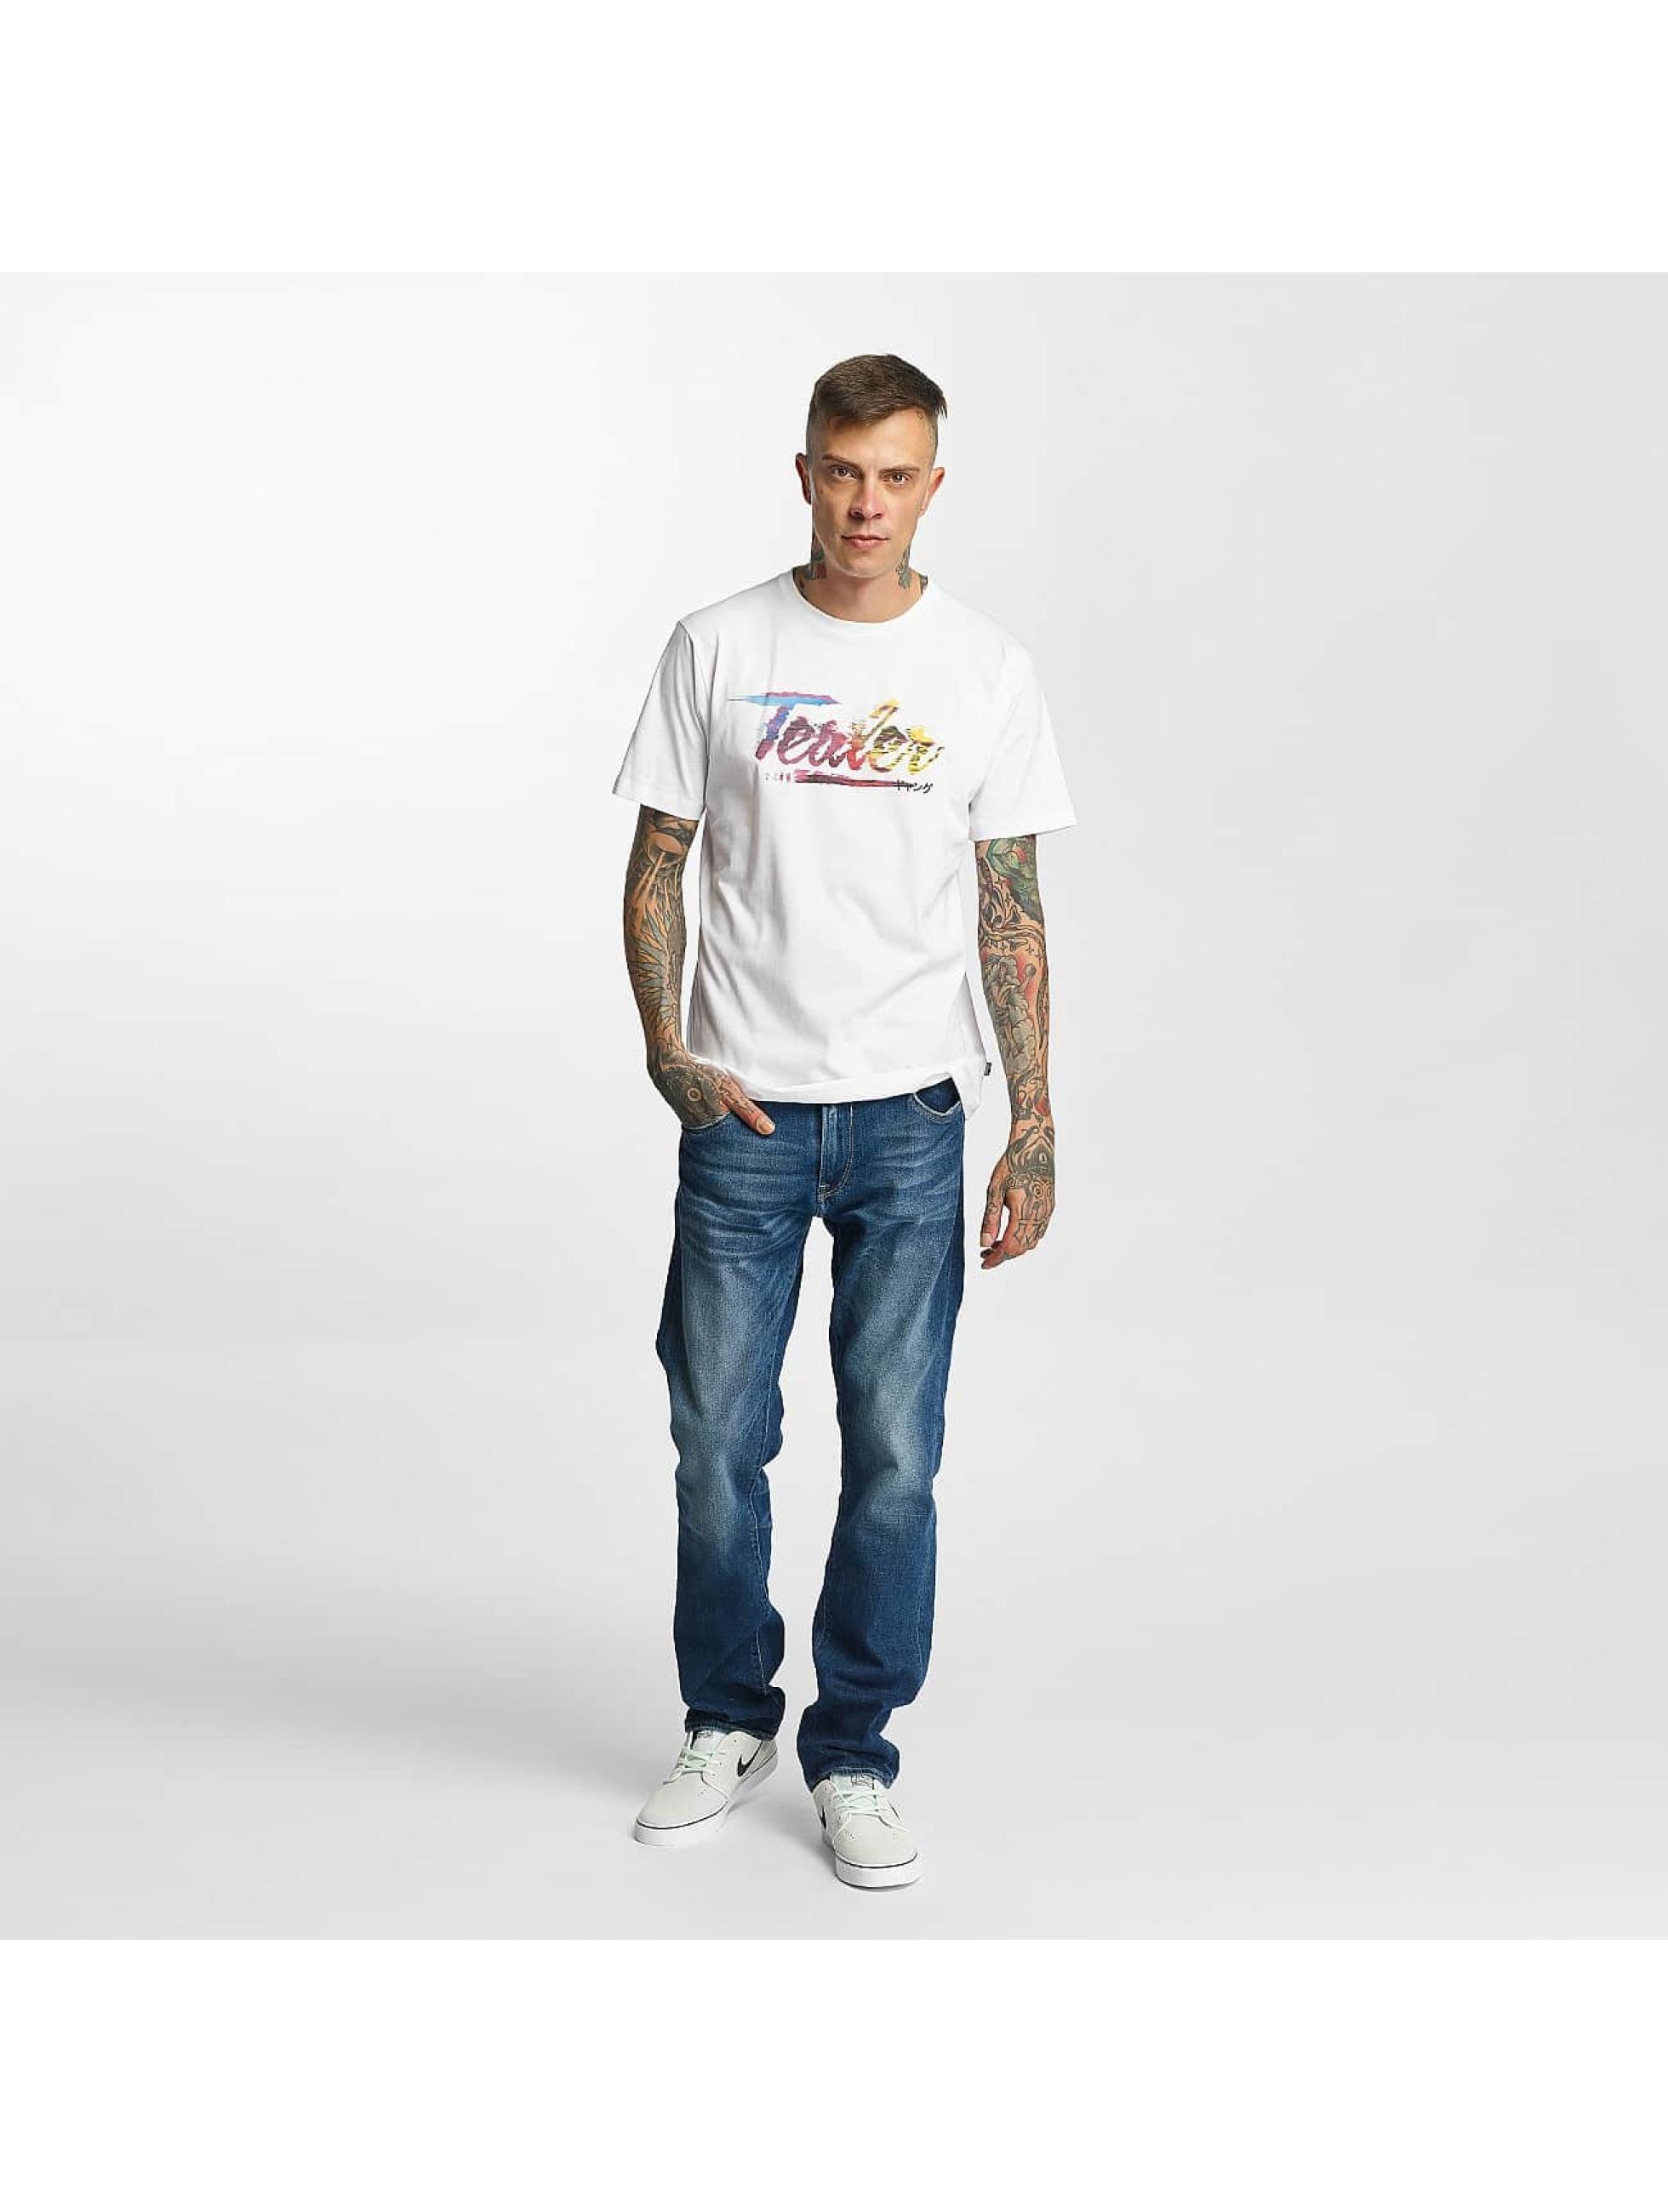 Tealer T-Shirt Glitch Color white